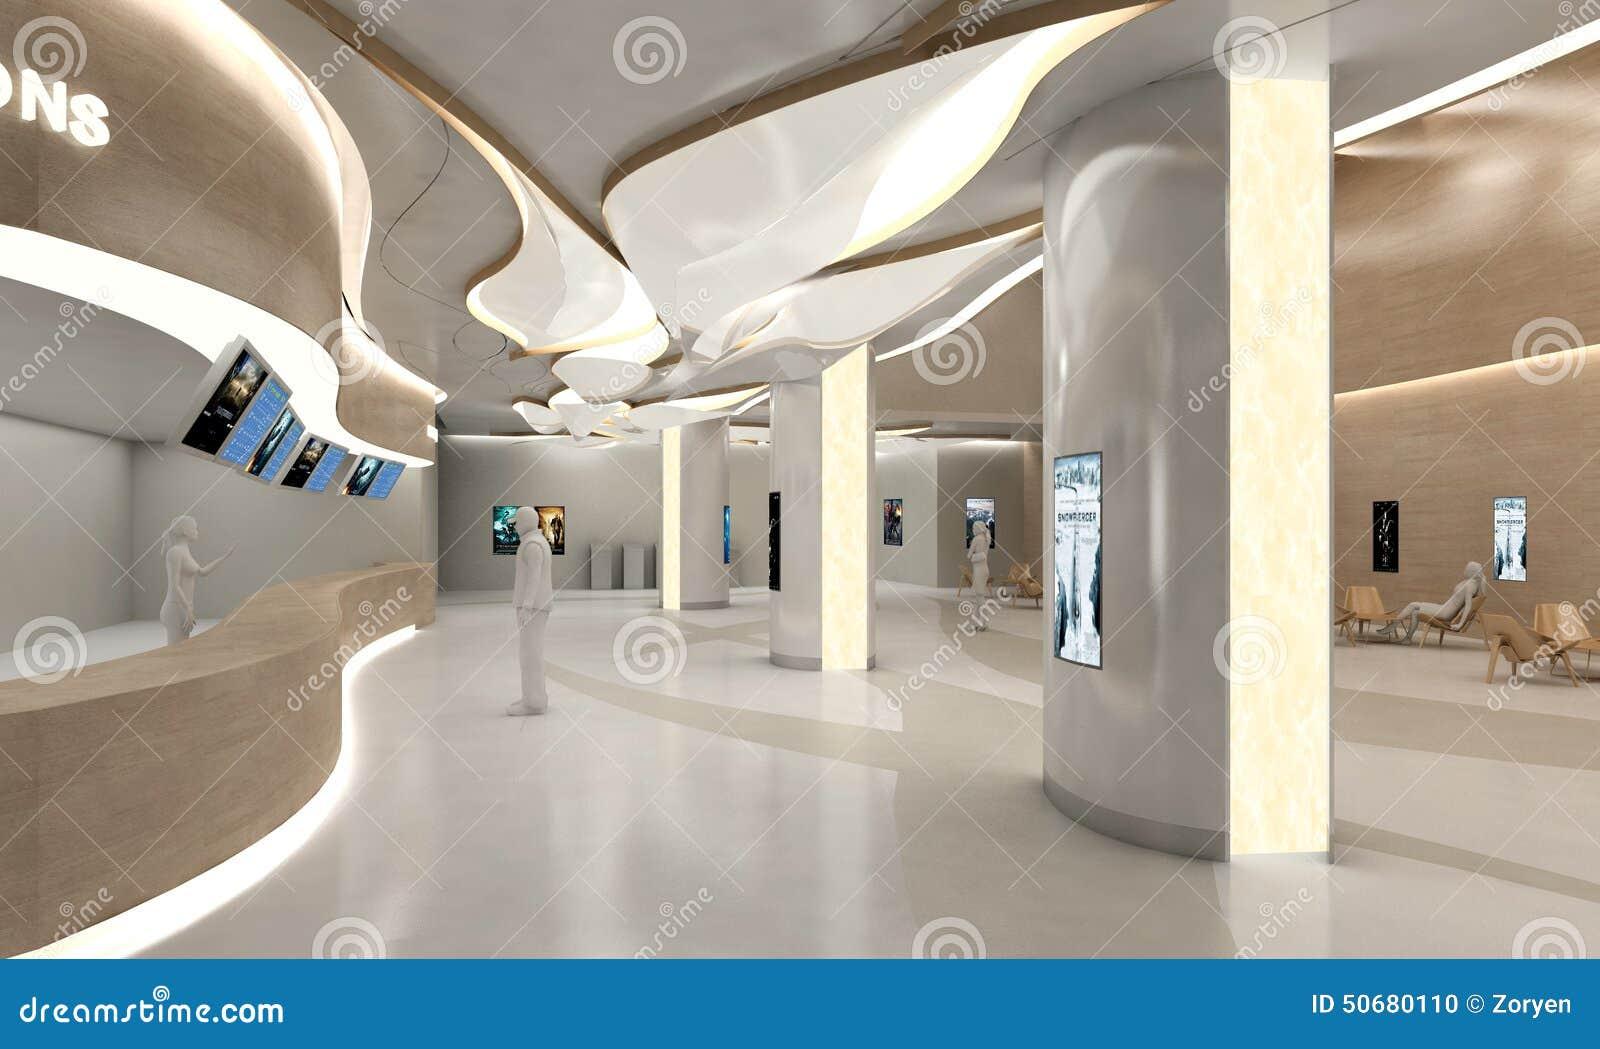 Download 时髦的现代大厦大厅 库存照片. 图片 包括有 拱道, 服务台, 表示, 内部, 里面, 视觉, 弯曲, 布琼布拉 - 50680110